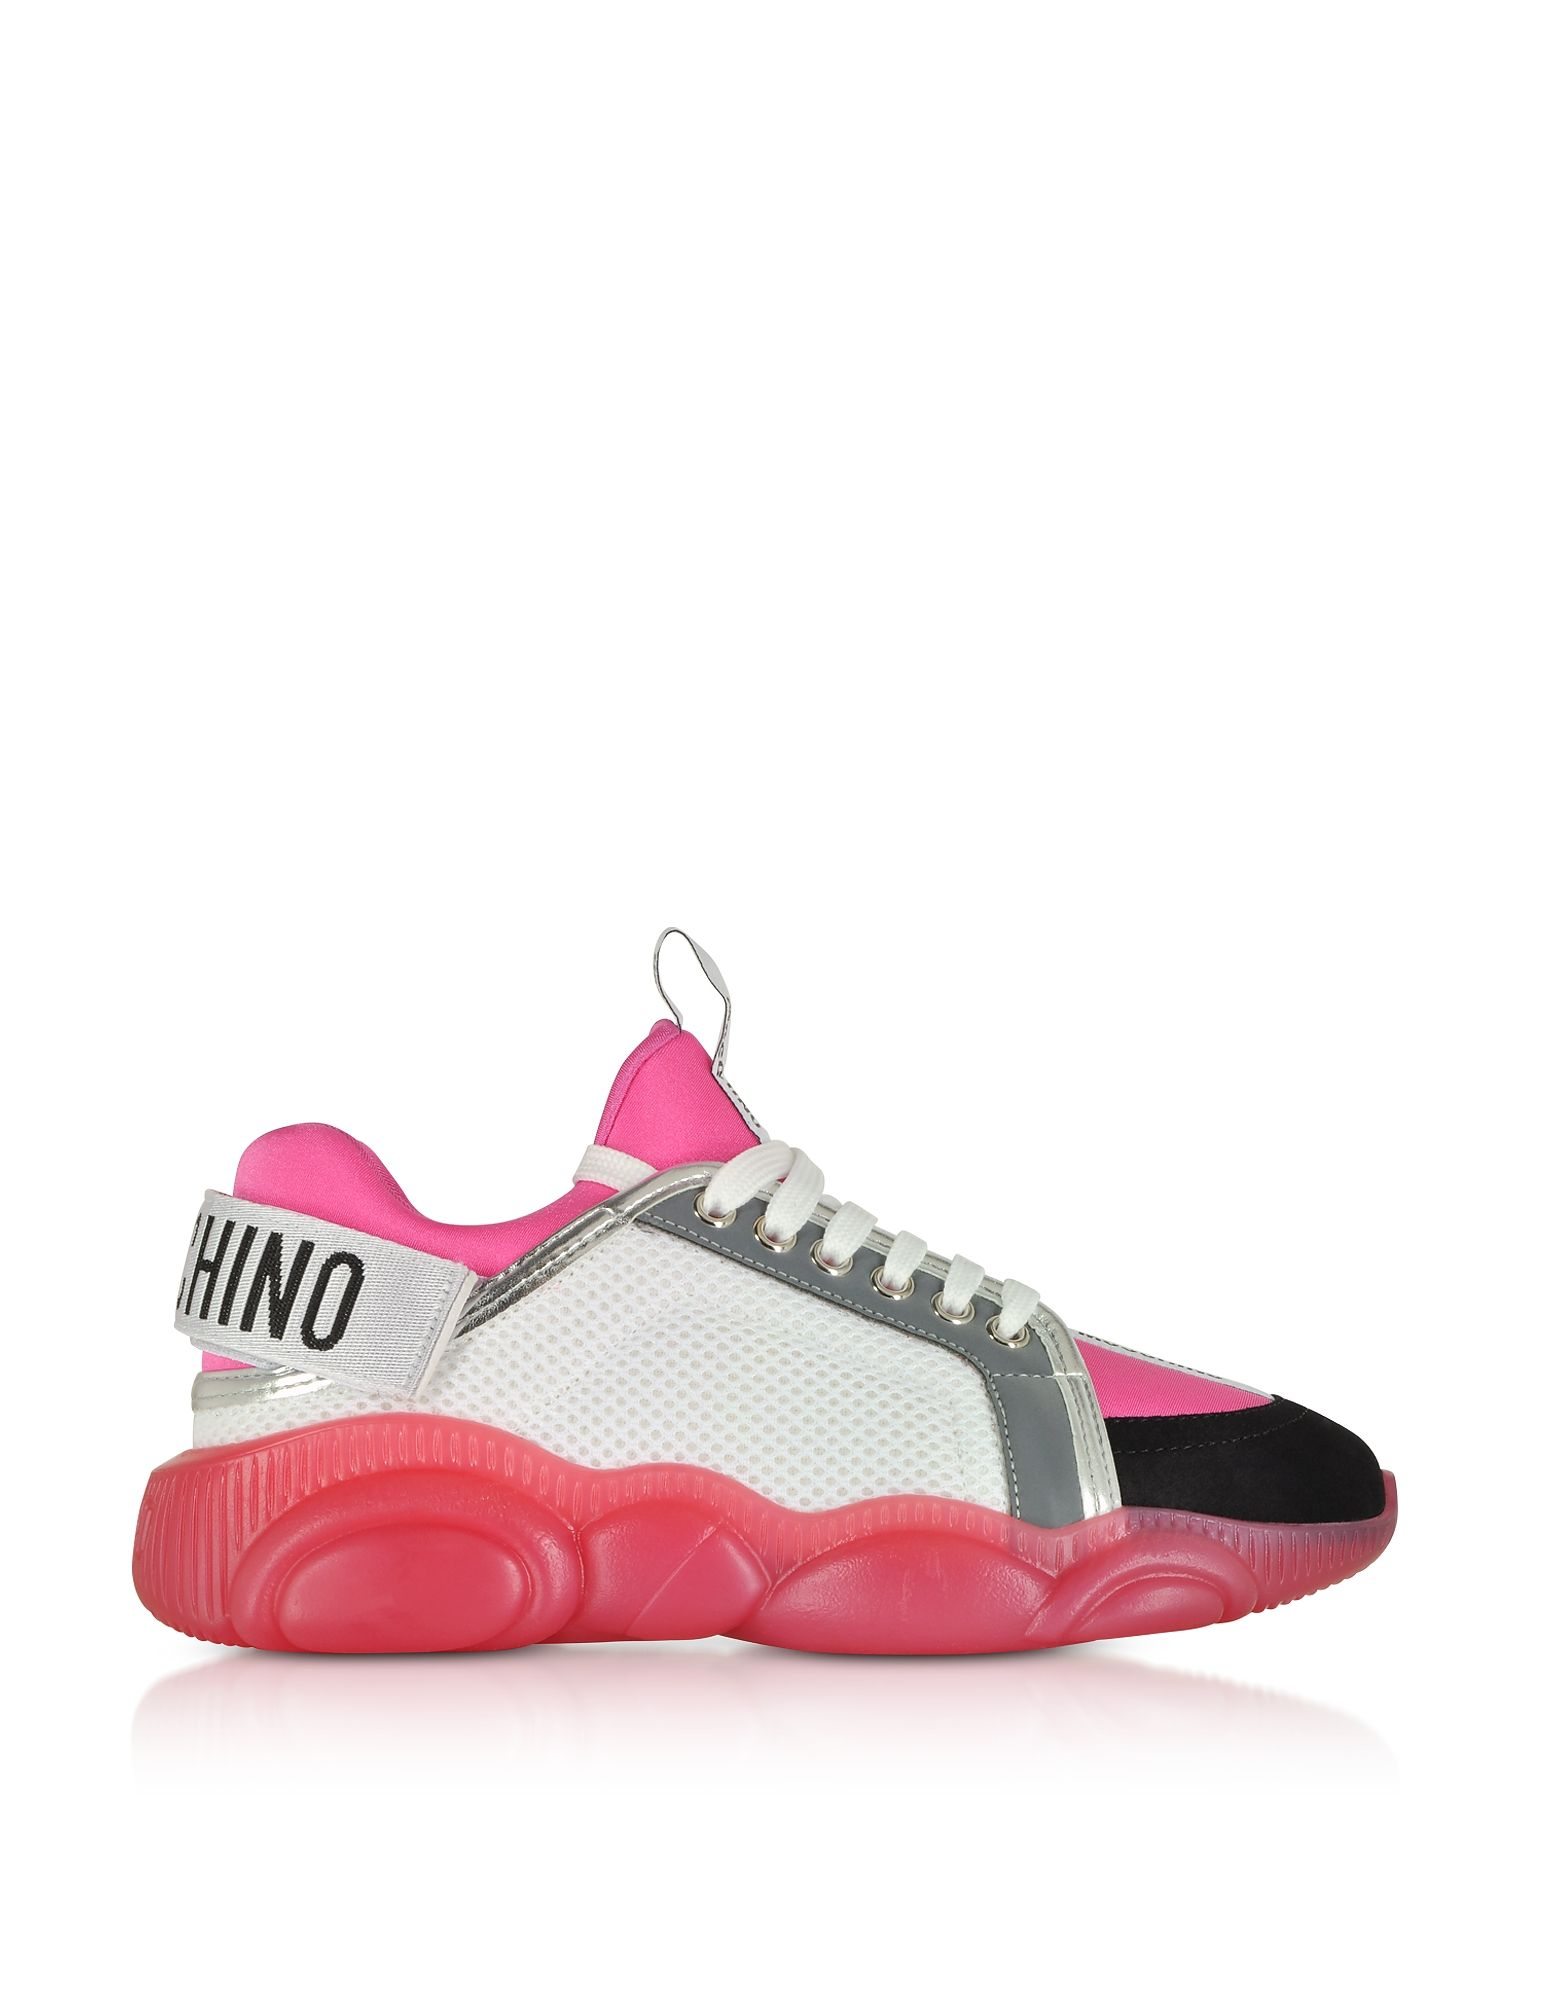 faa321bd4fda7 Moschino Sneakers Teddy Run With Strap Color White / Pink | ModeSens